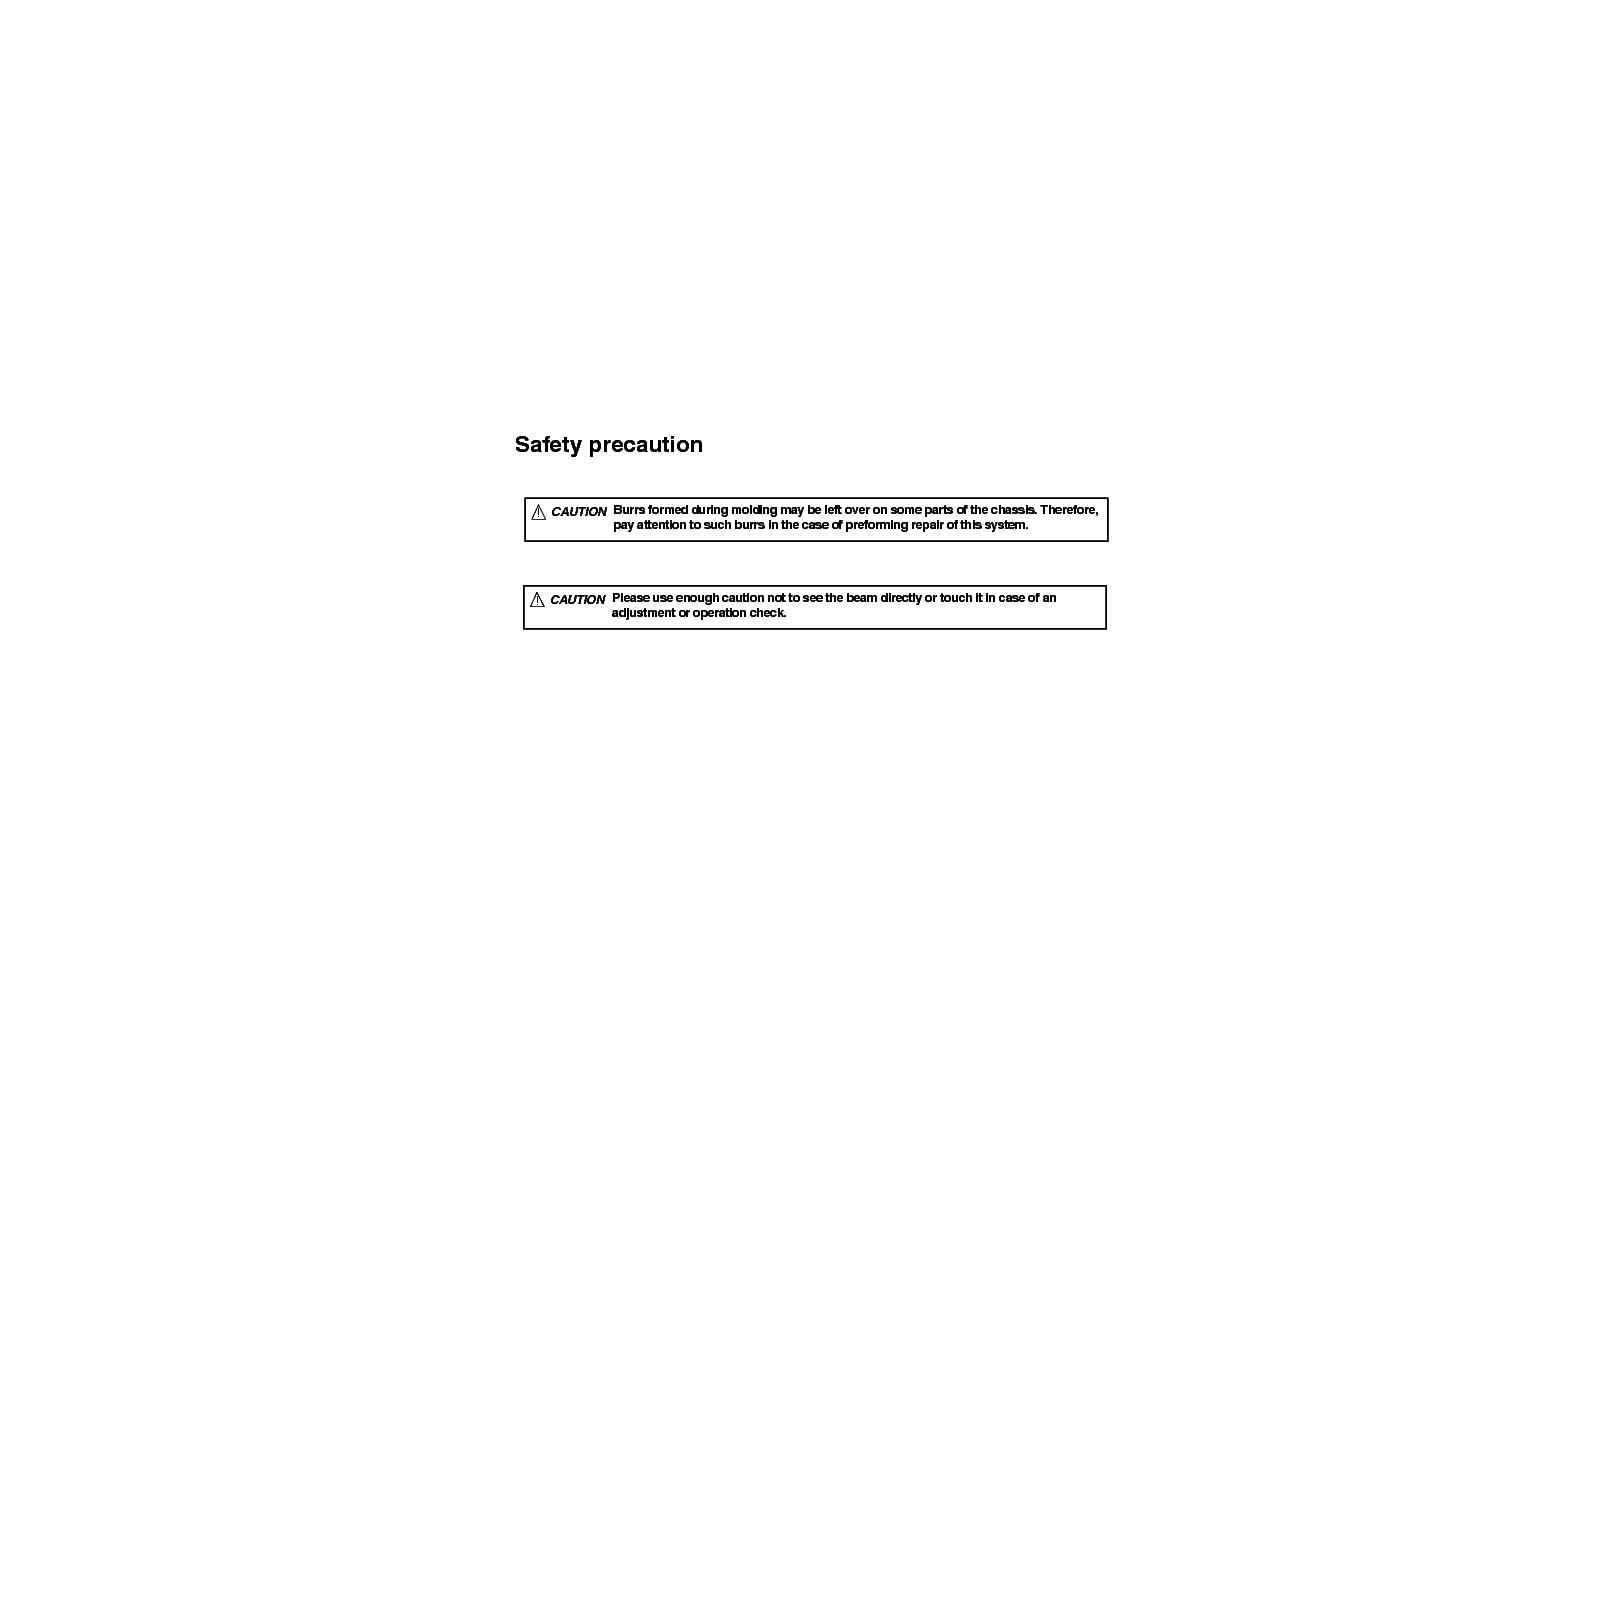 Jvc Kd-sr60 Wiring Diagram 🔥 Jvc Kd Sr72 Instruction Manual Pdf Download Of Jvc Kd-sr60 Wiring Diagram